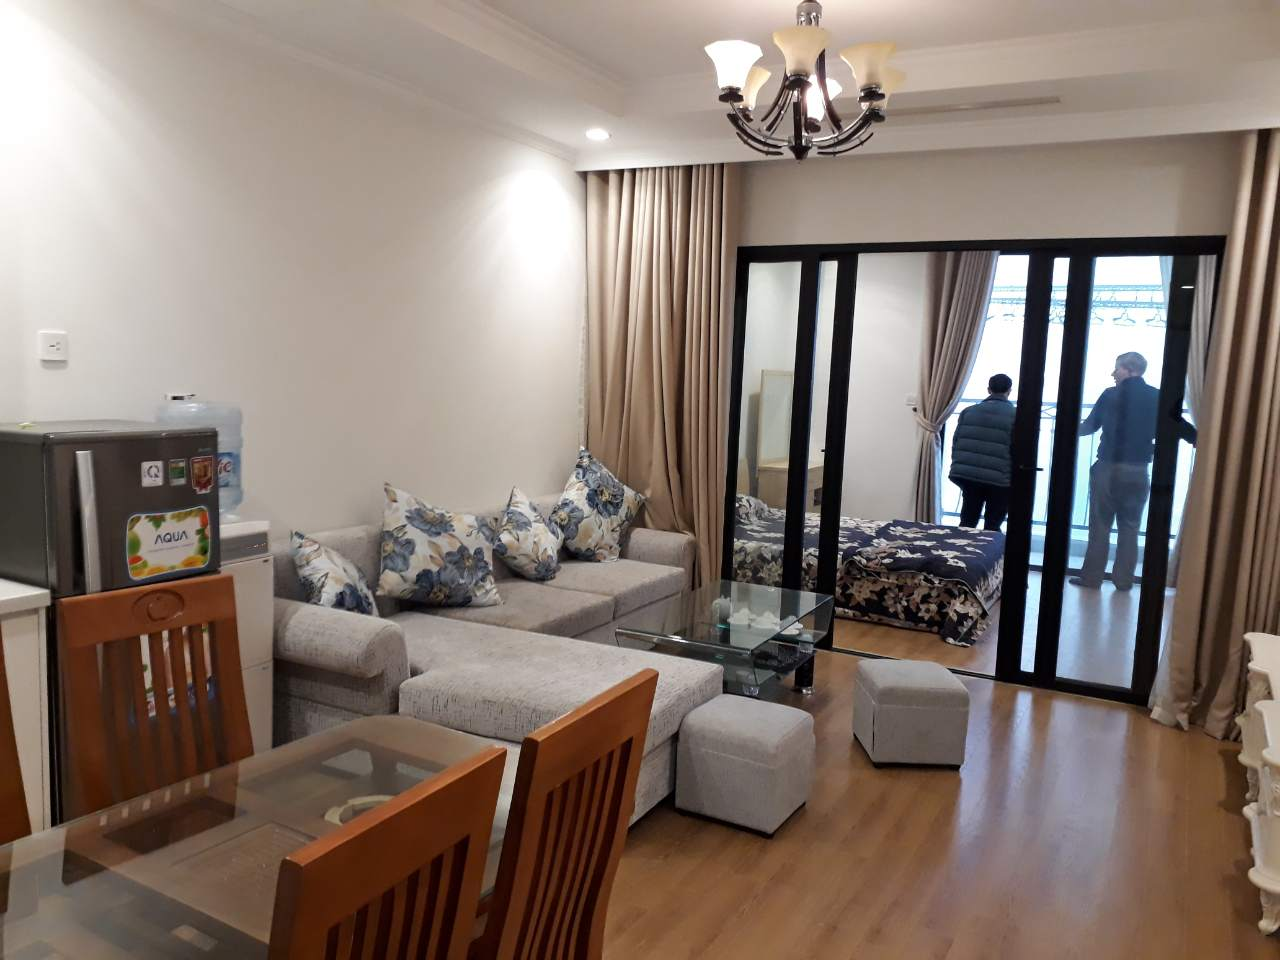 Room for rent in R6 Royal City, Hanoi